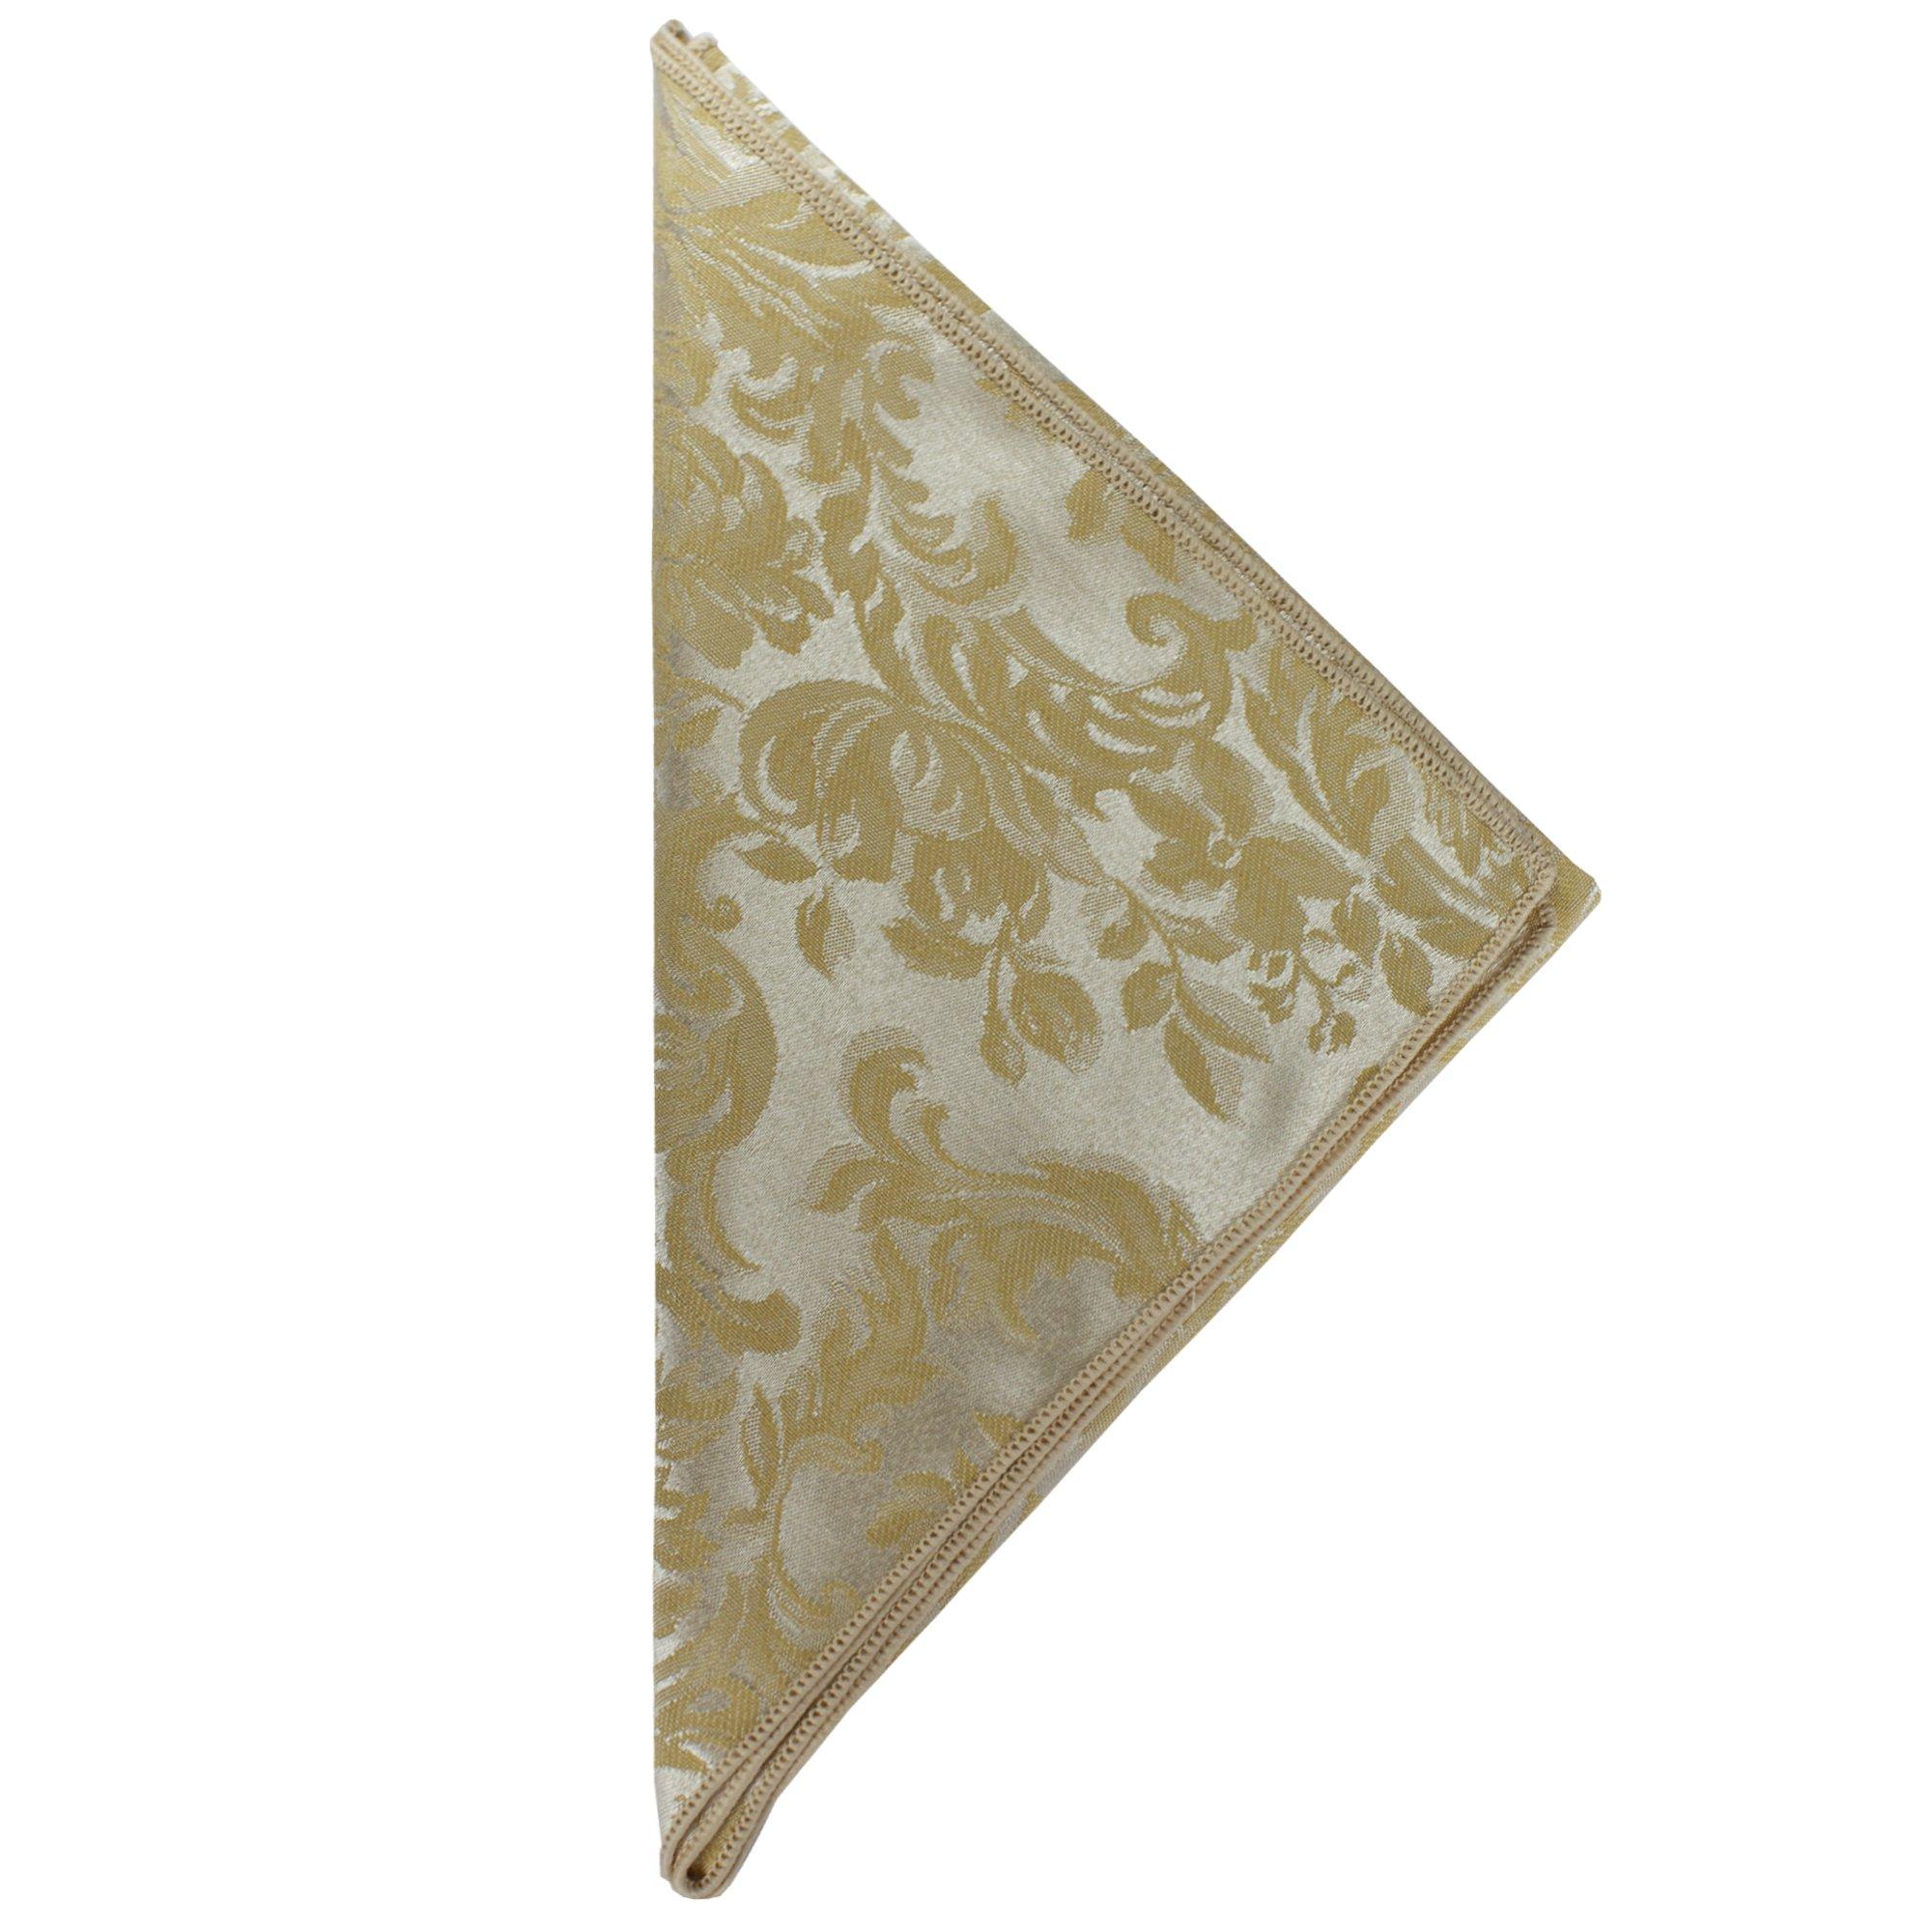 Ultimate Textile (10 Dozen) Miranda 20 x 20-Inch Damask Cloth Dinner Napkins- Jacquard Weave, Champagne Ivory Cream